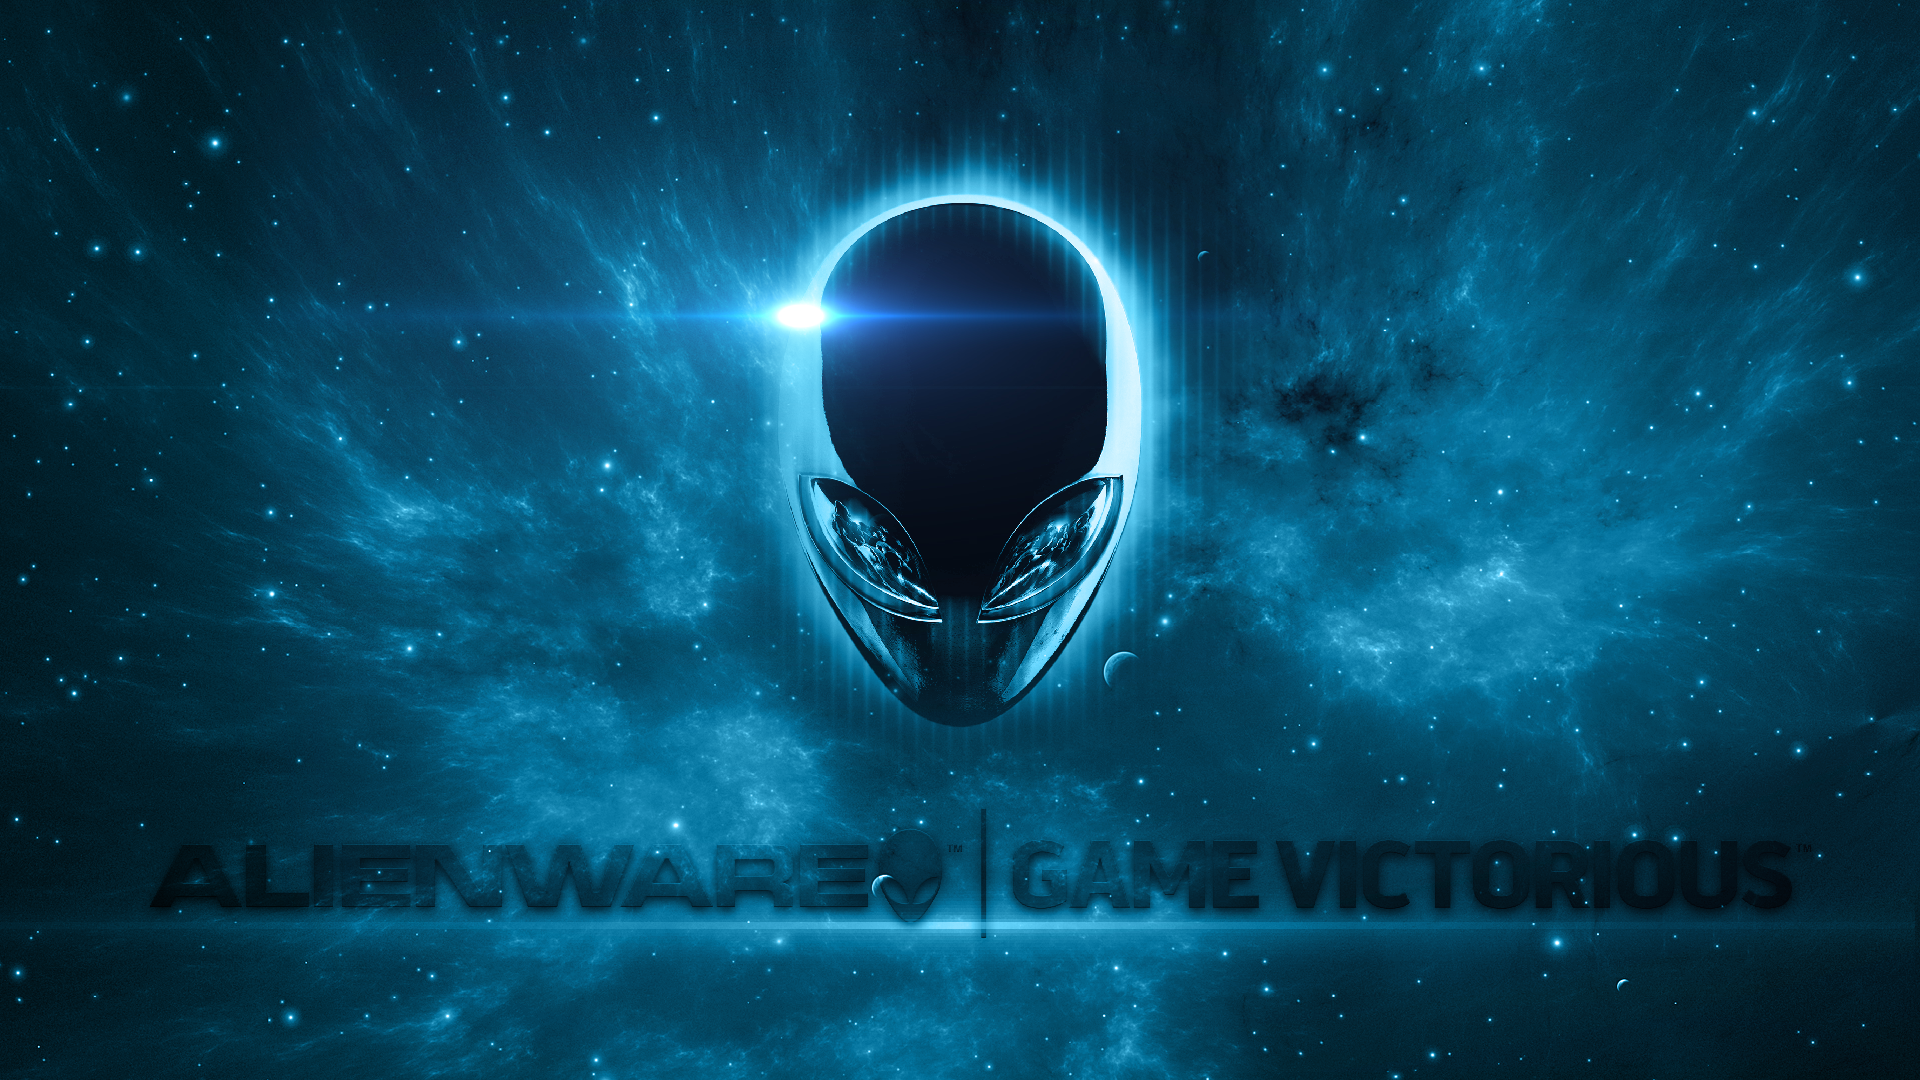 Alienware Moving Wallpaper